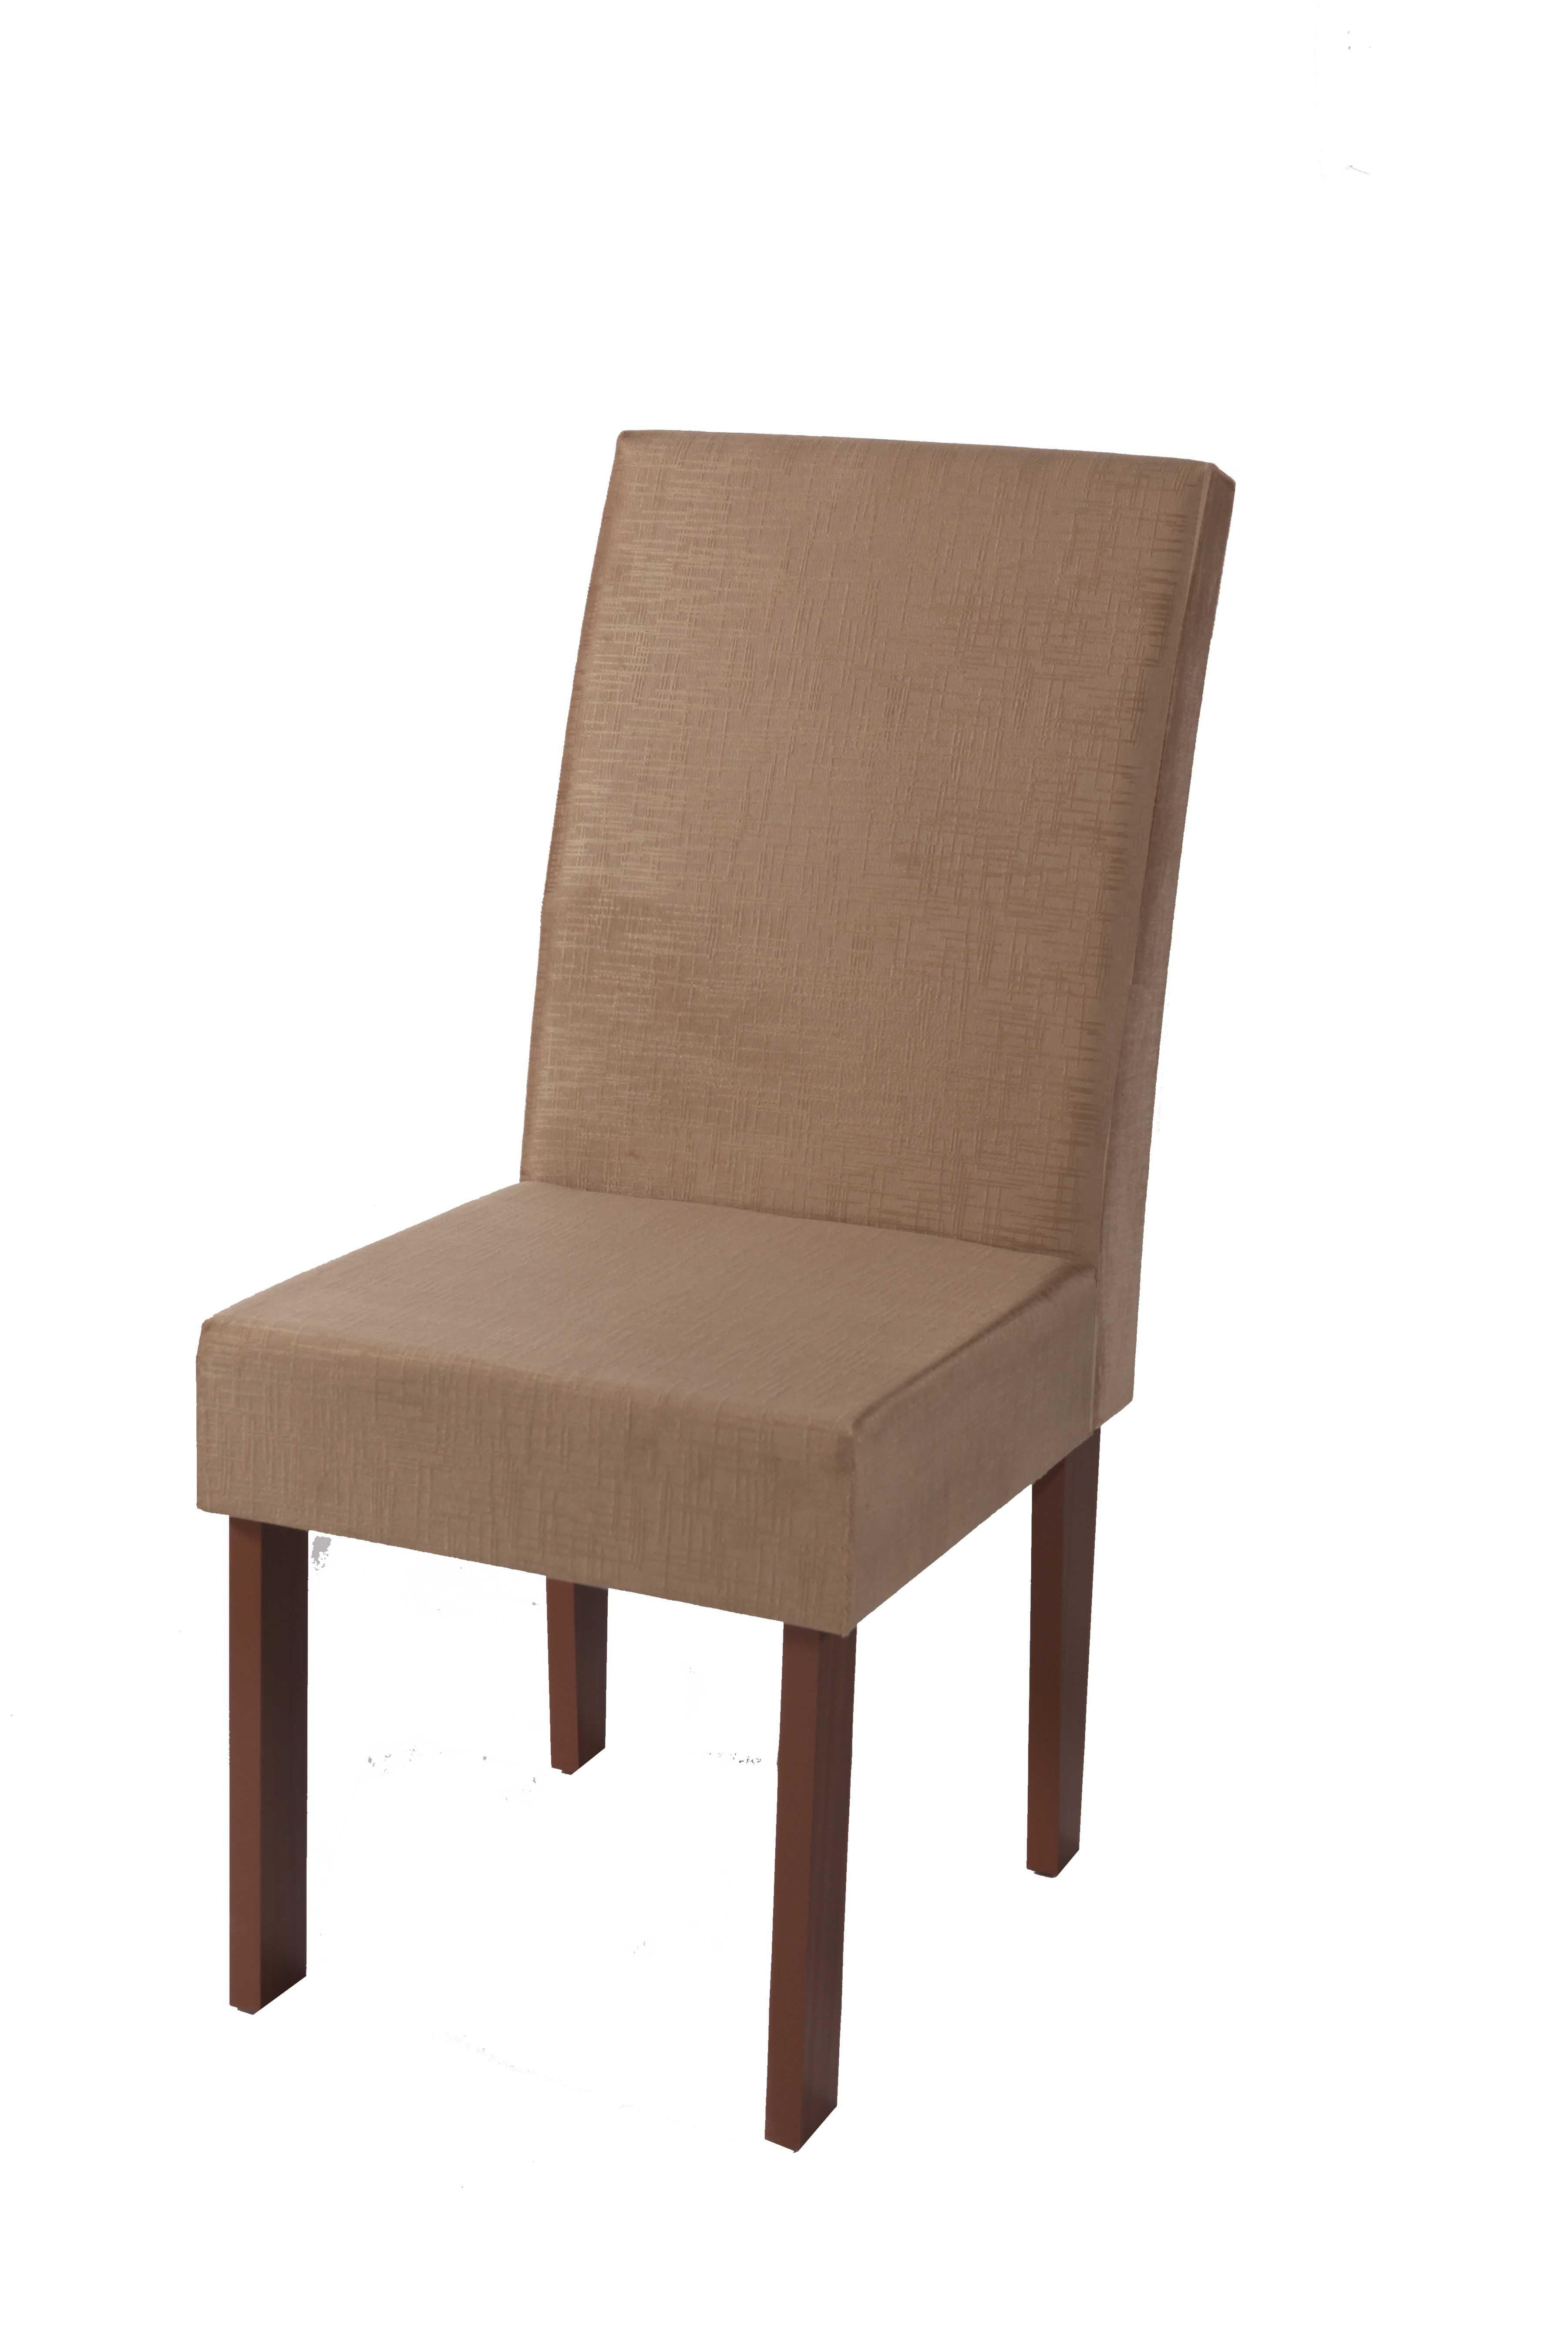 Cadeira_Cristal__Cedro_Fosco_-___Veloart_Bege